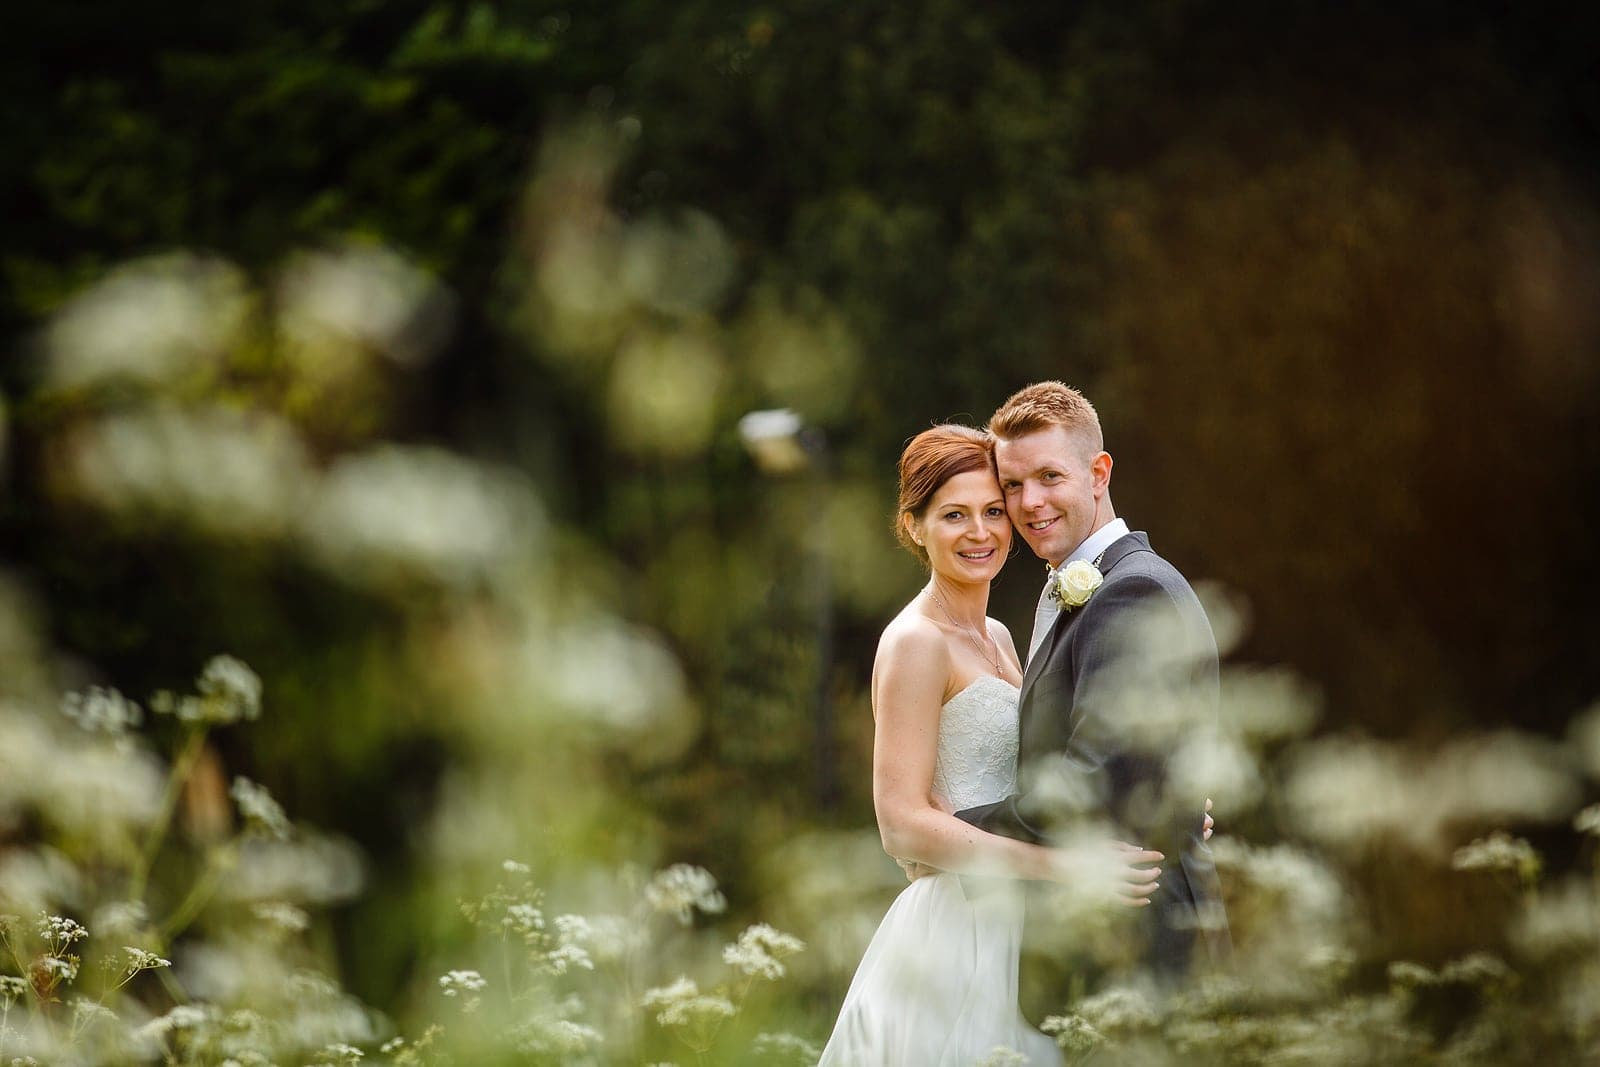 Megan & Chris's Hengrave Hall wedding